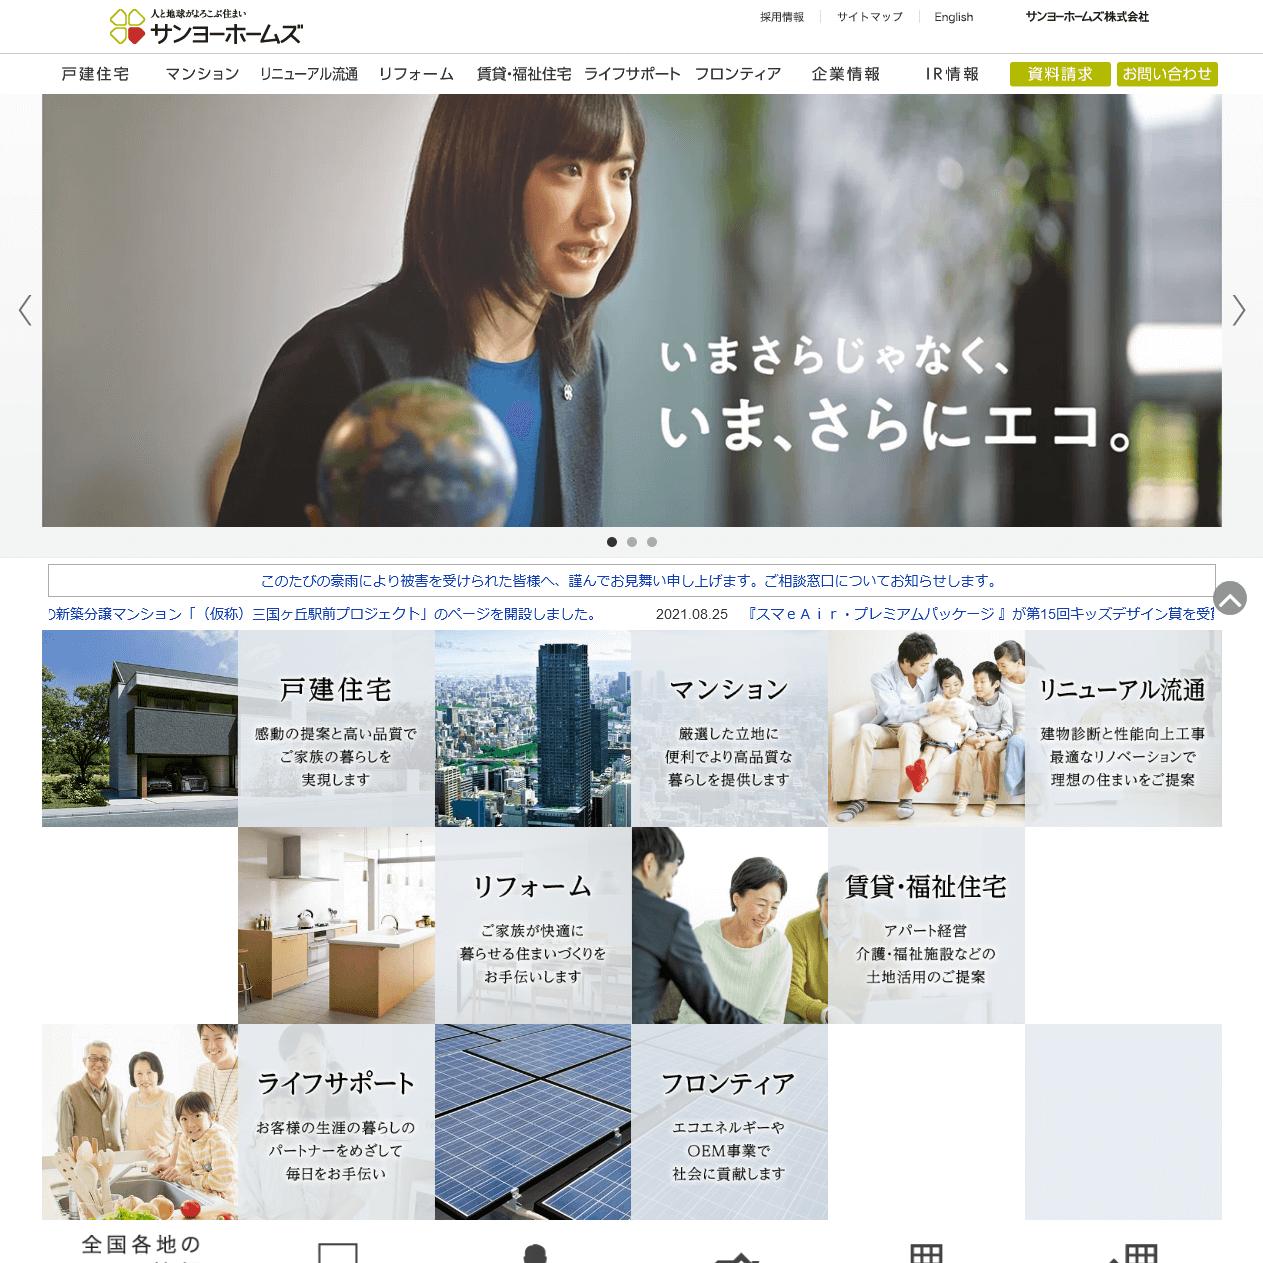 "<span class=""title"">サンヨーホームズ株式会社の口コミや評判</span>"